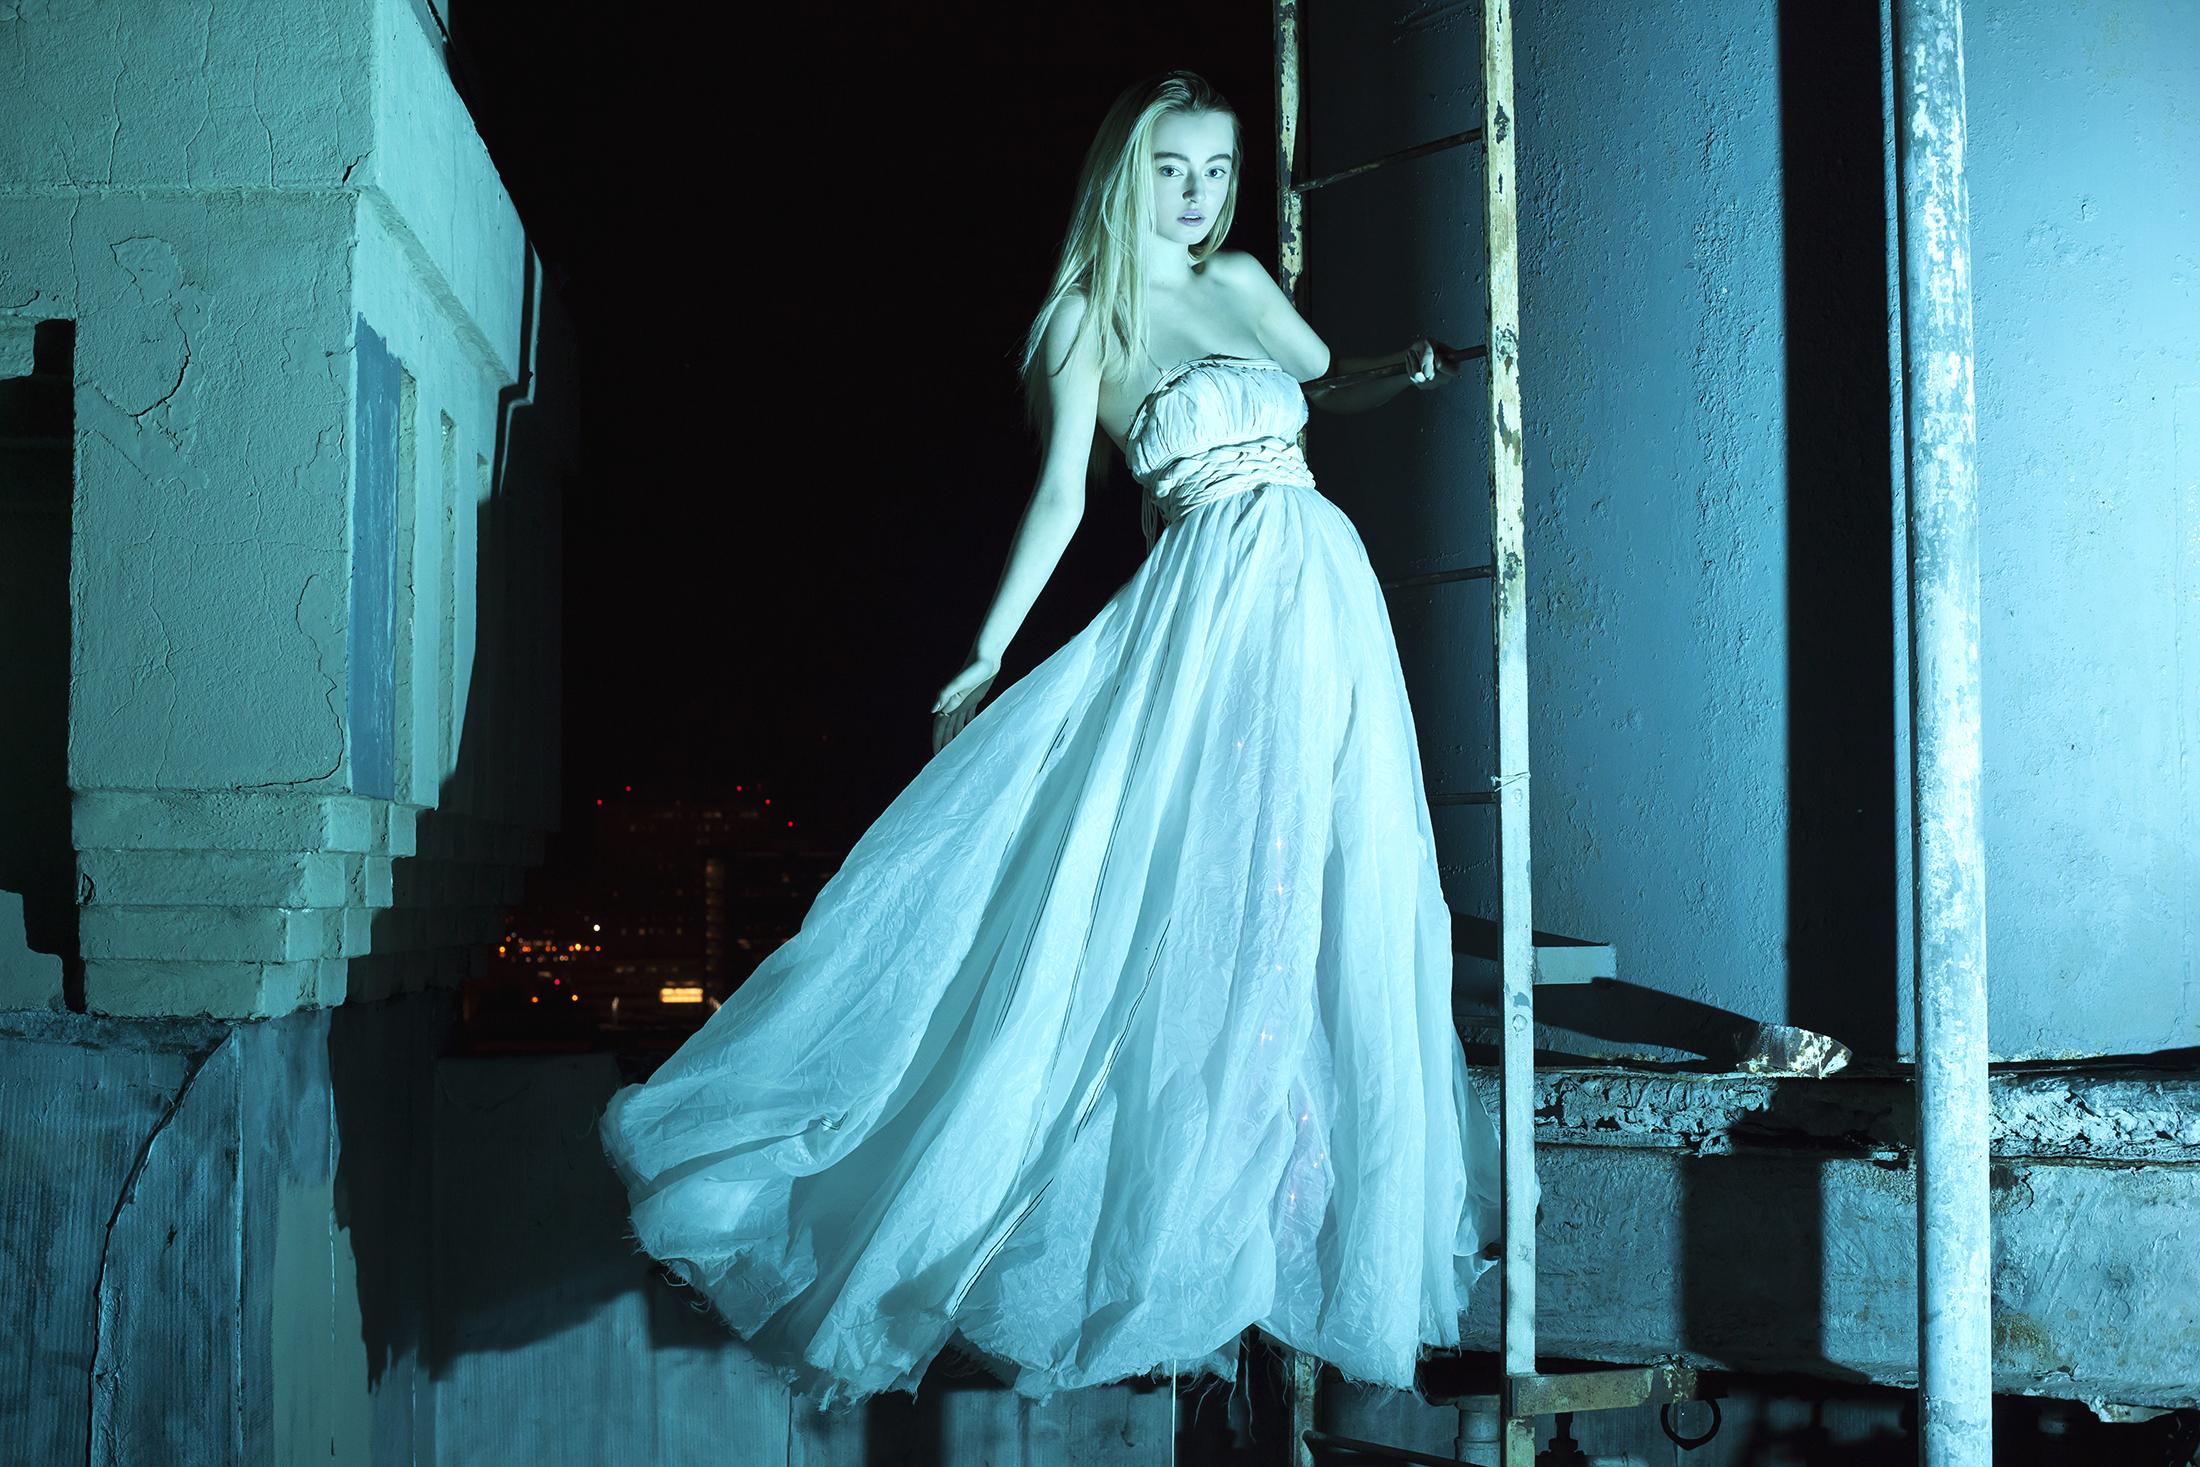 Click_Models_Savannah_Adina_Doria_25.jpg